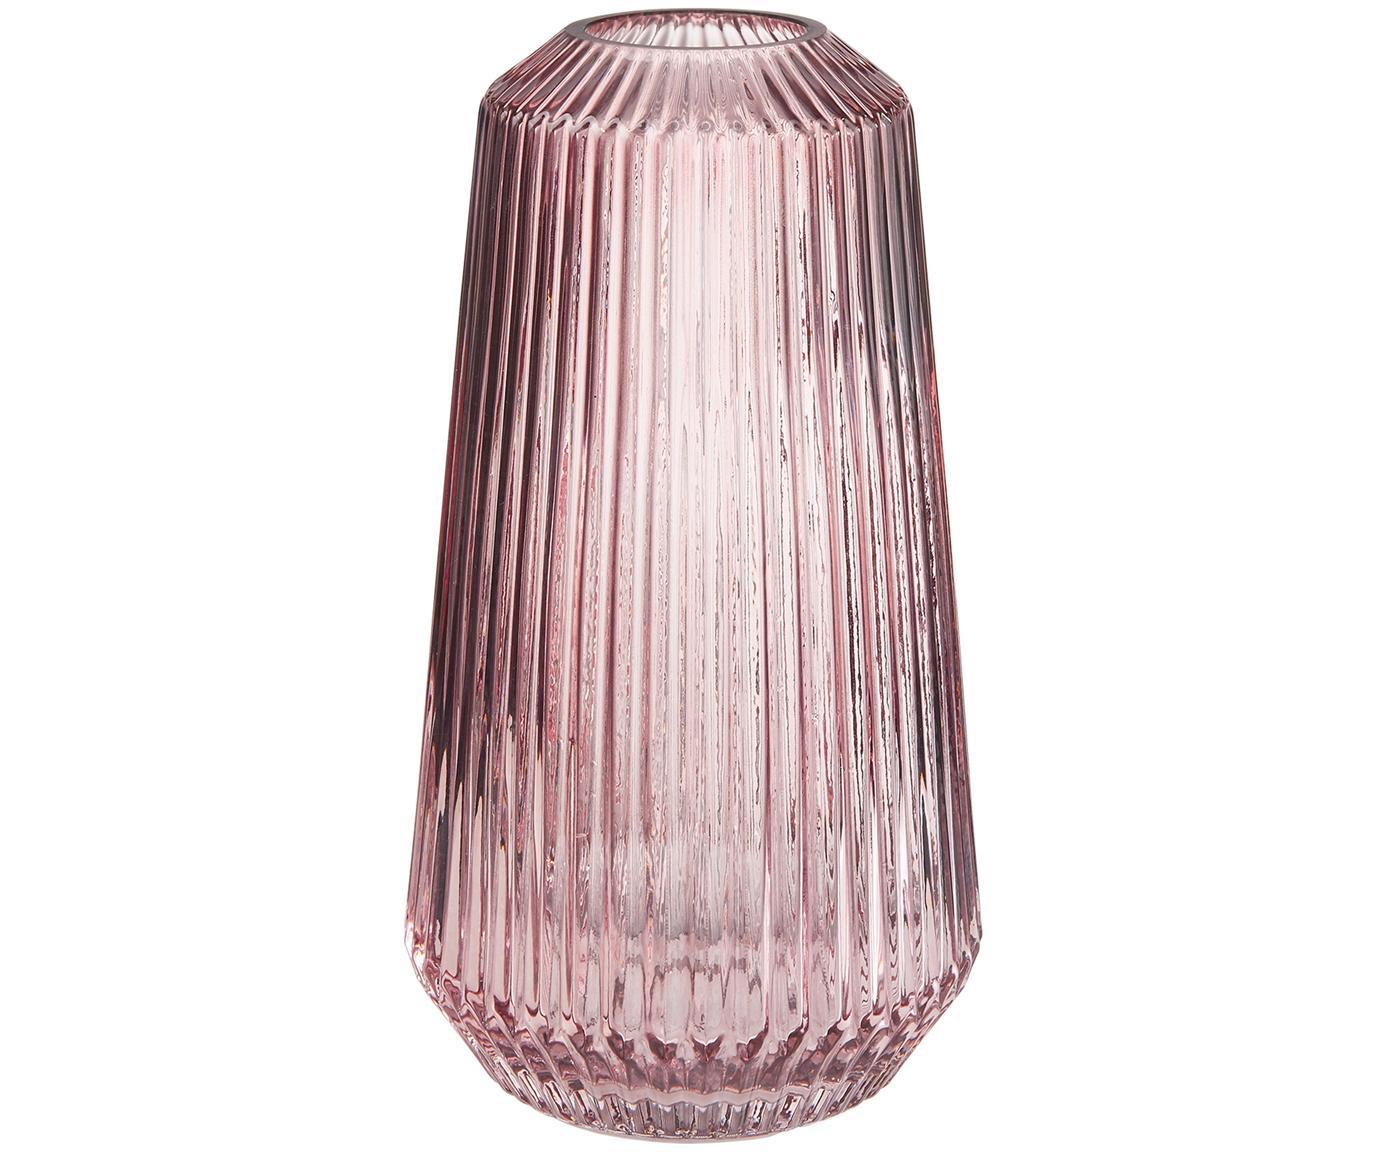 Jarrón de vidrio Lily, Vidrio, Rosa, transparente, Ø 14 x Al 25 cm